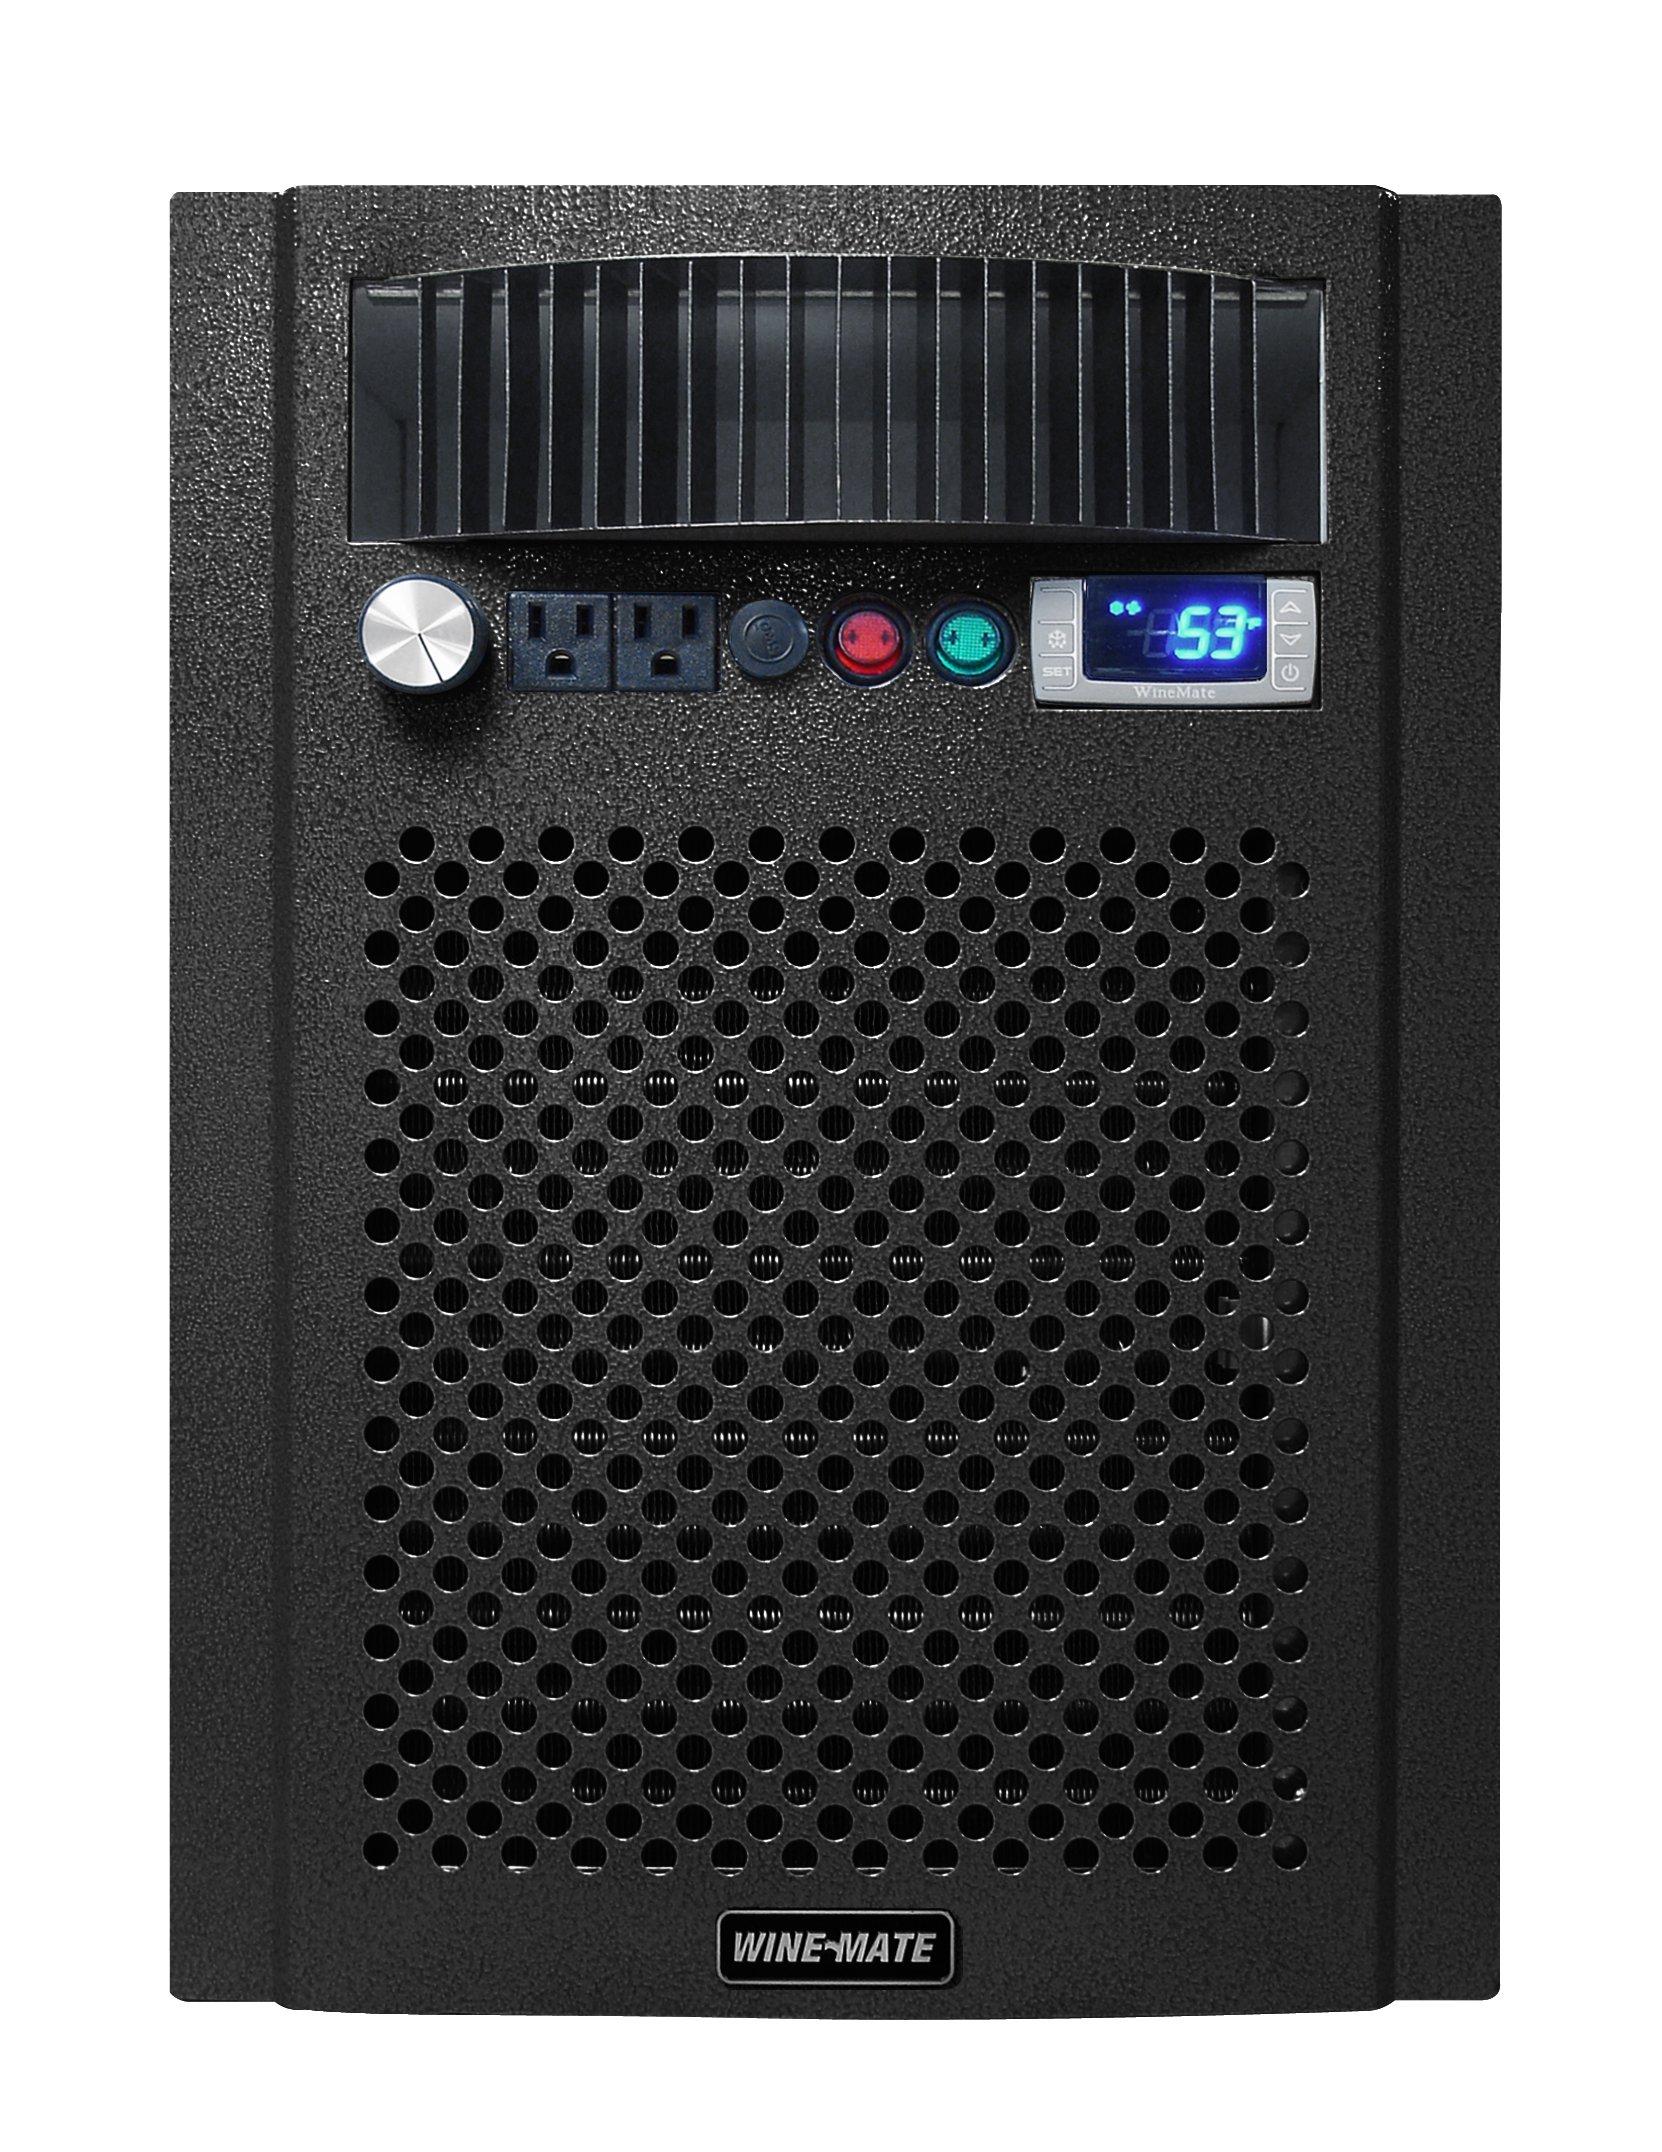 Vinotemp VNTWM-4510HZD 4510HZD Customizable Wine Cooling System by Vinotemp